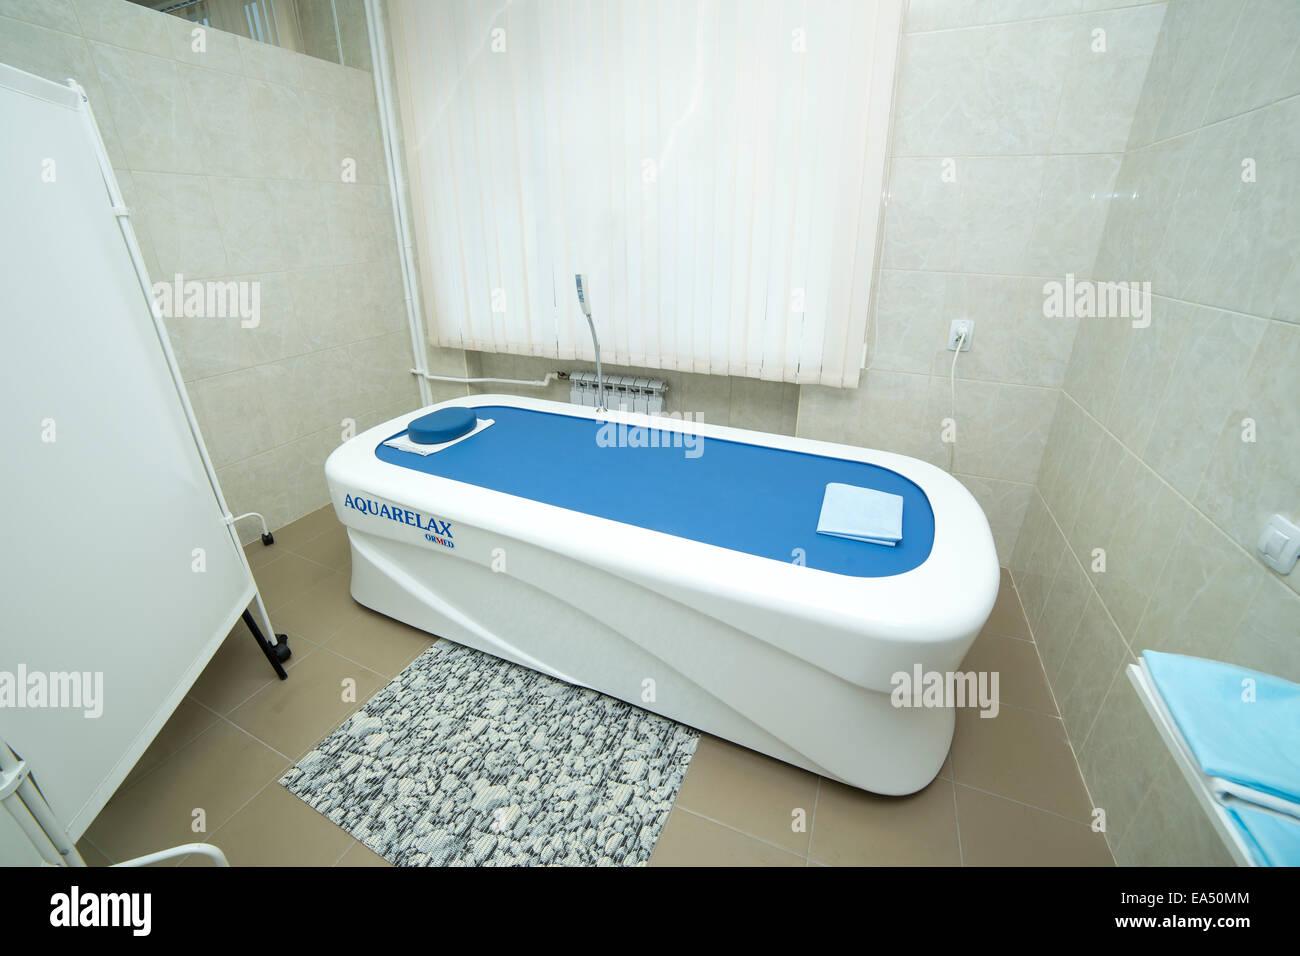 Bathtub for water massage, Aquarelax, spa salon Stock Photo ...